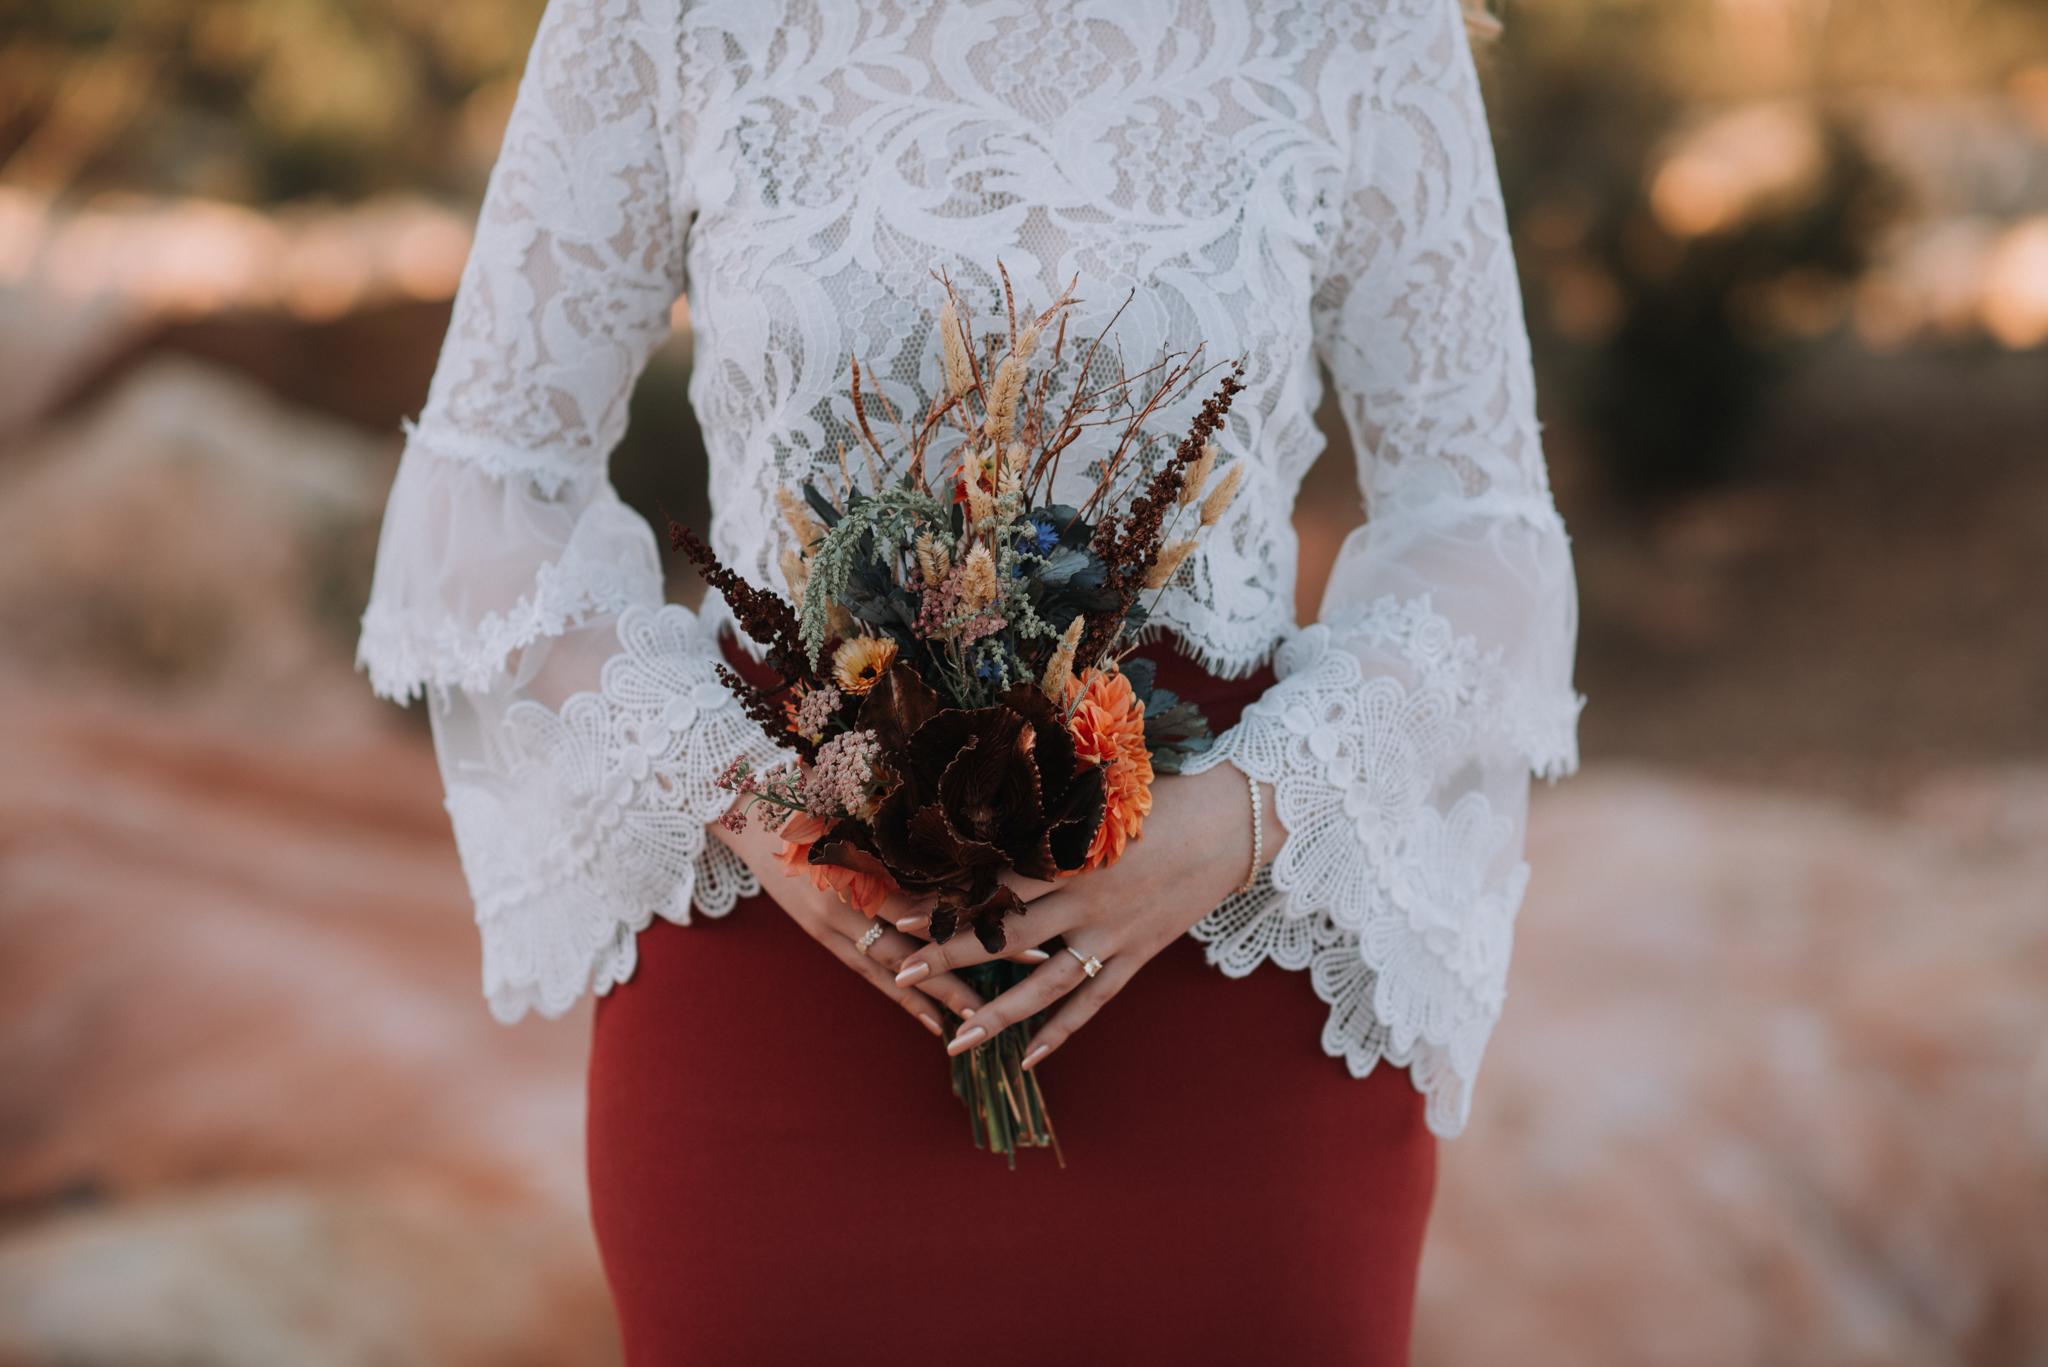 LOVELENSCAPES PHOTOGRAPHY • VISUAL POETRY • MELBOURNE WEDDING PHOTOGRAPHER • ALANNAH HILL DRESS • SUNSET ENGAGEMENT PHOTOS • PINK CLIFFS HEATHCOTE • FASHION EDITORIAL PHOTOGRAPHER • 2.jpg